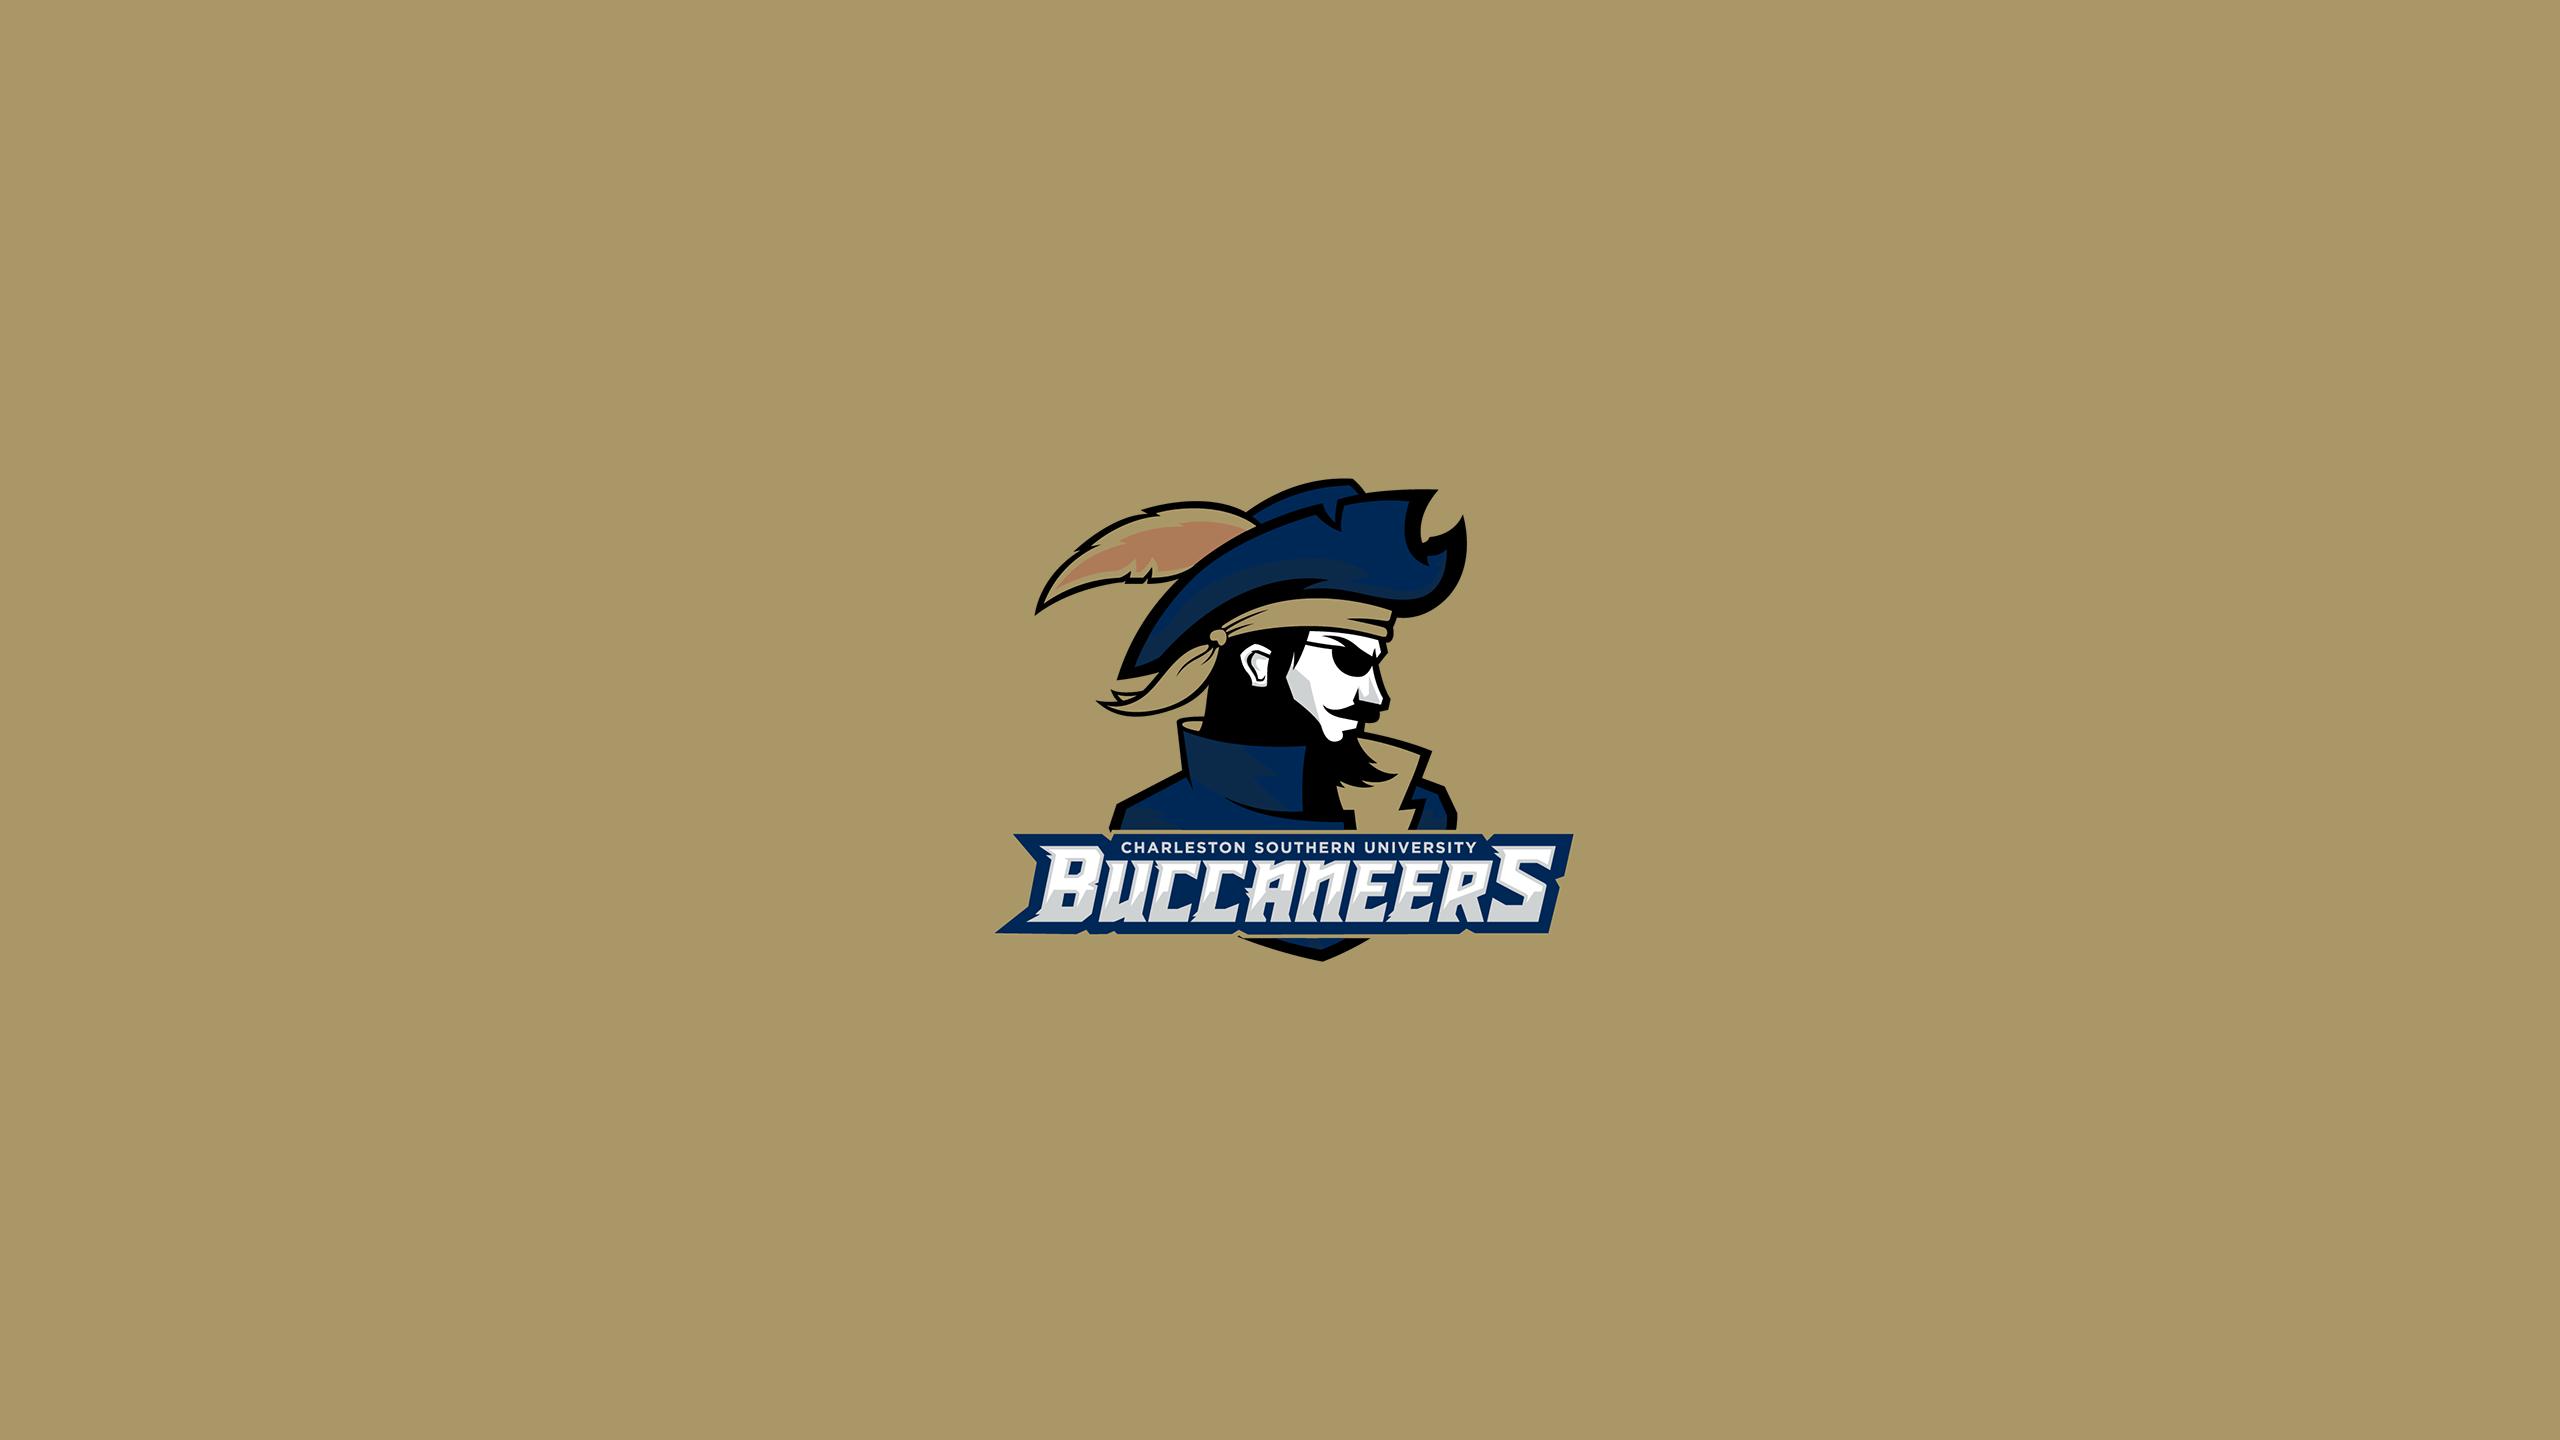 Charleston Southern University Buccaneers